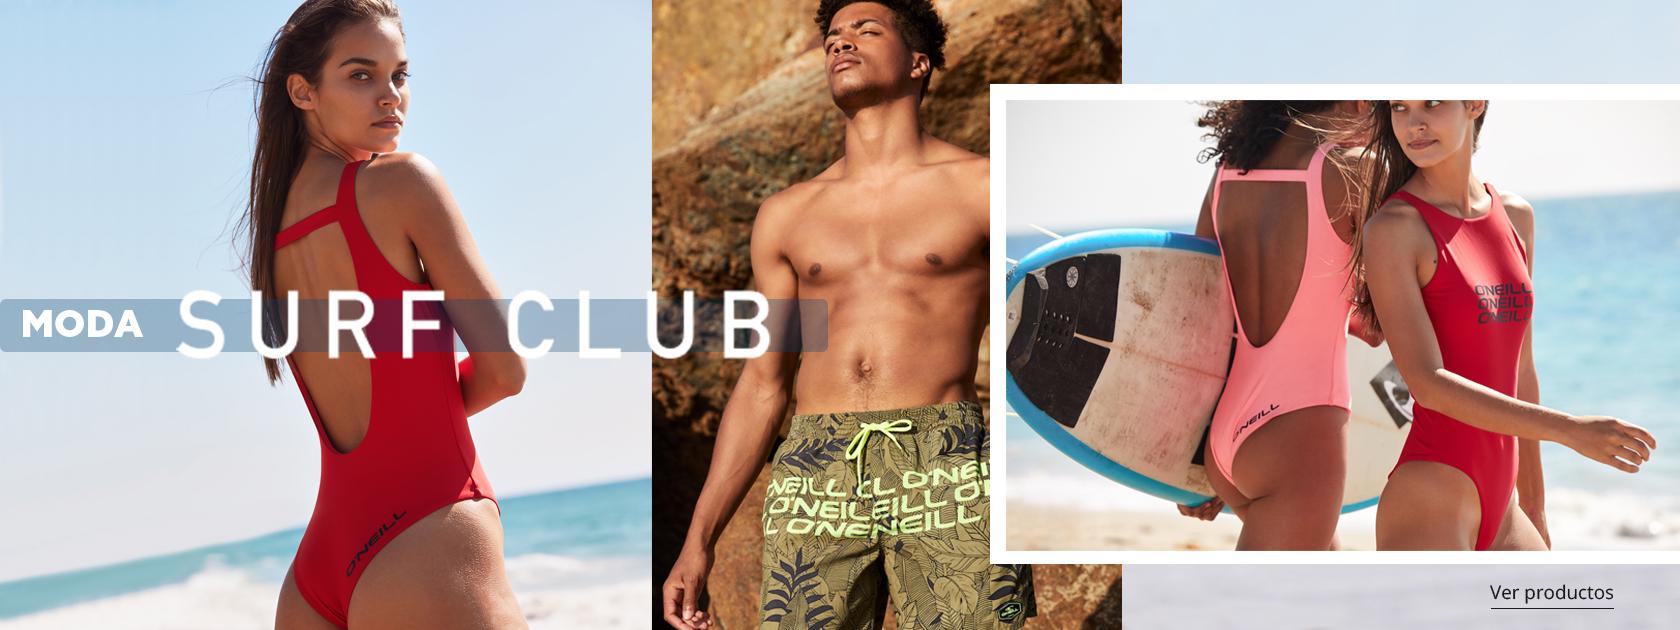 Ver todo moda surf club